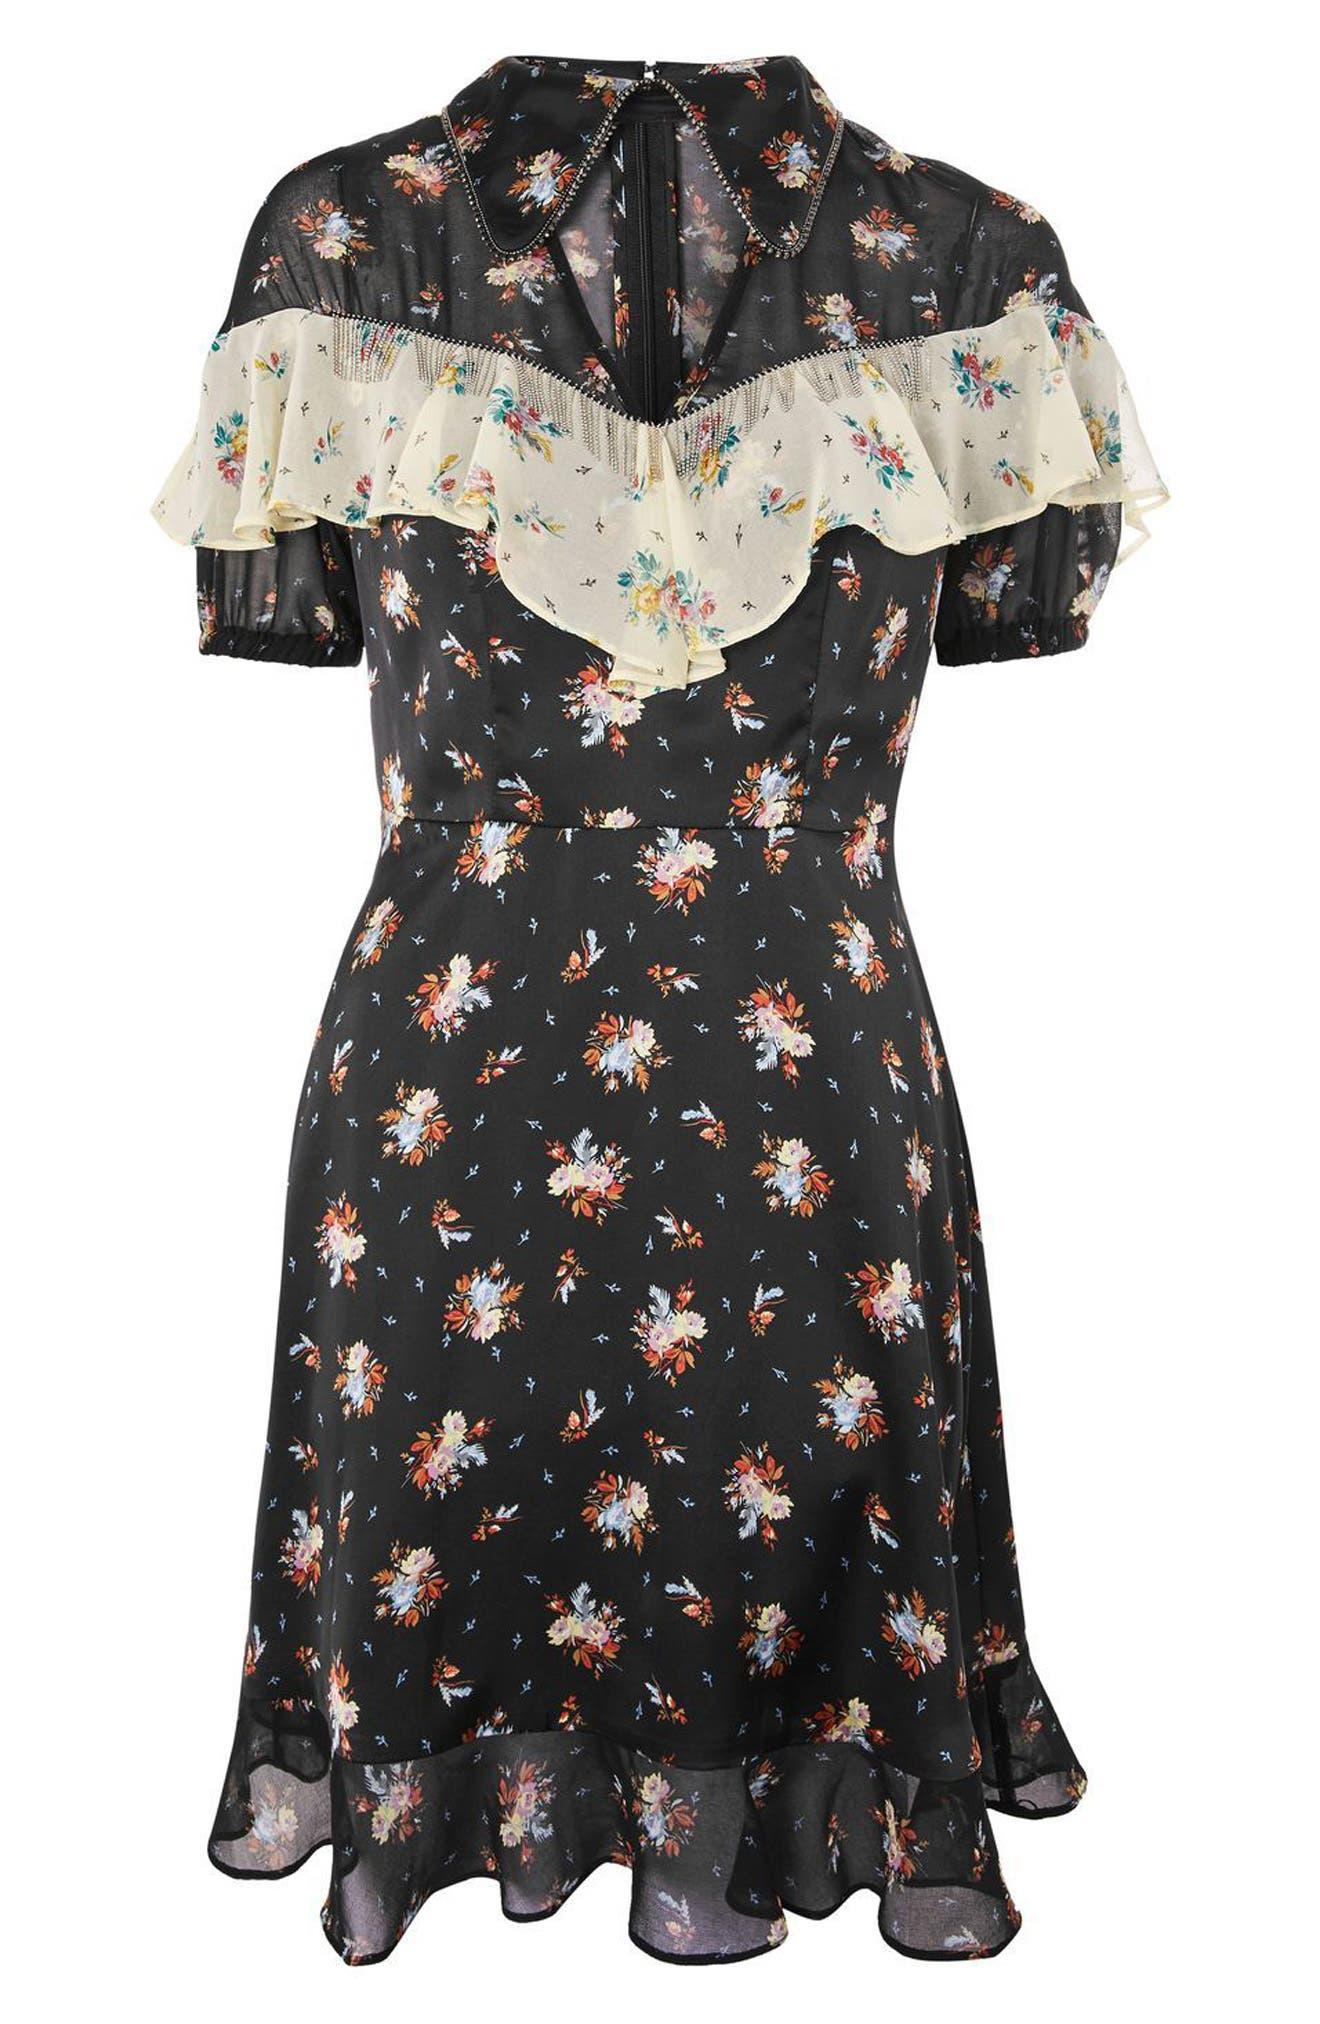 Rodeo Frill Western Skater Dress,                             Alternate thumbnail 4, color,                             Black Multi